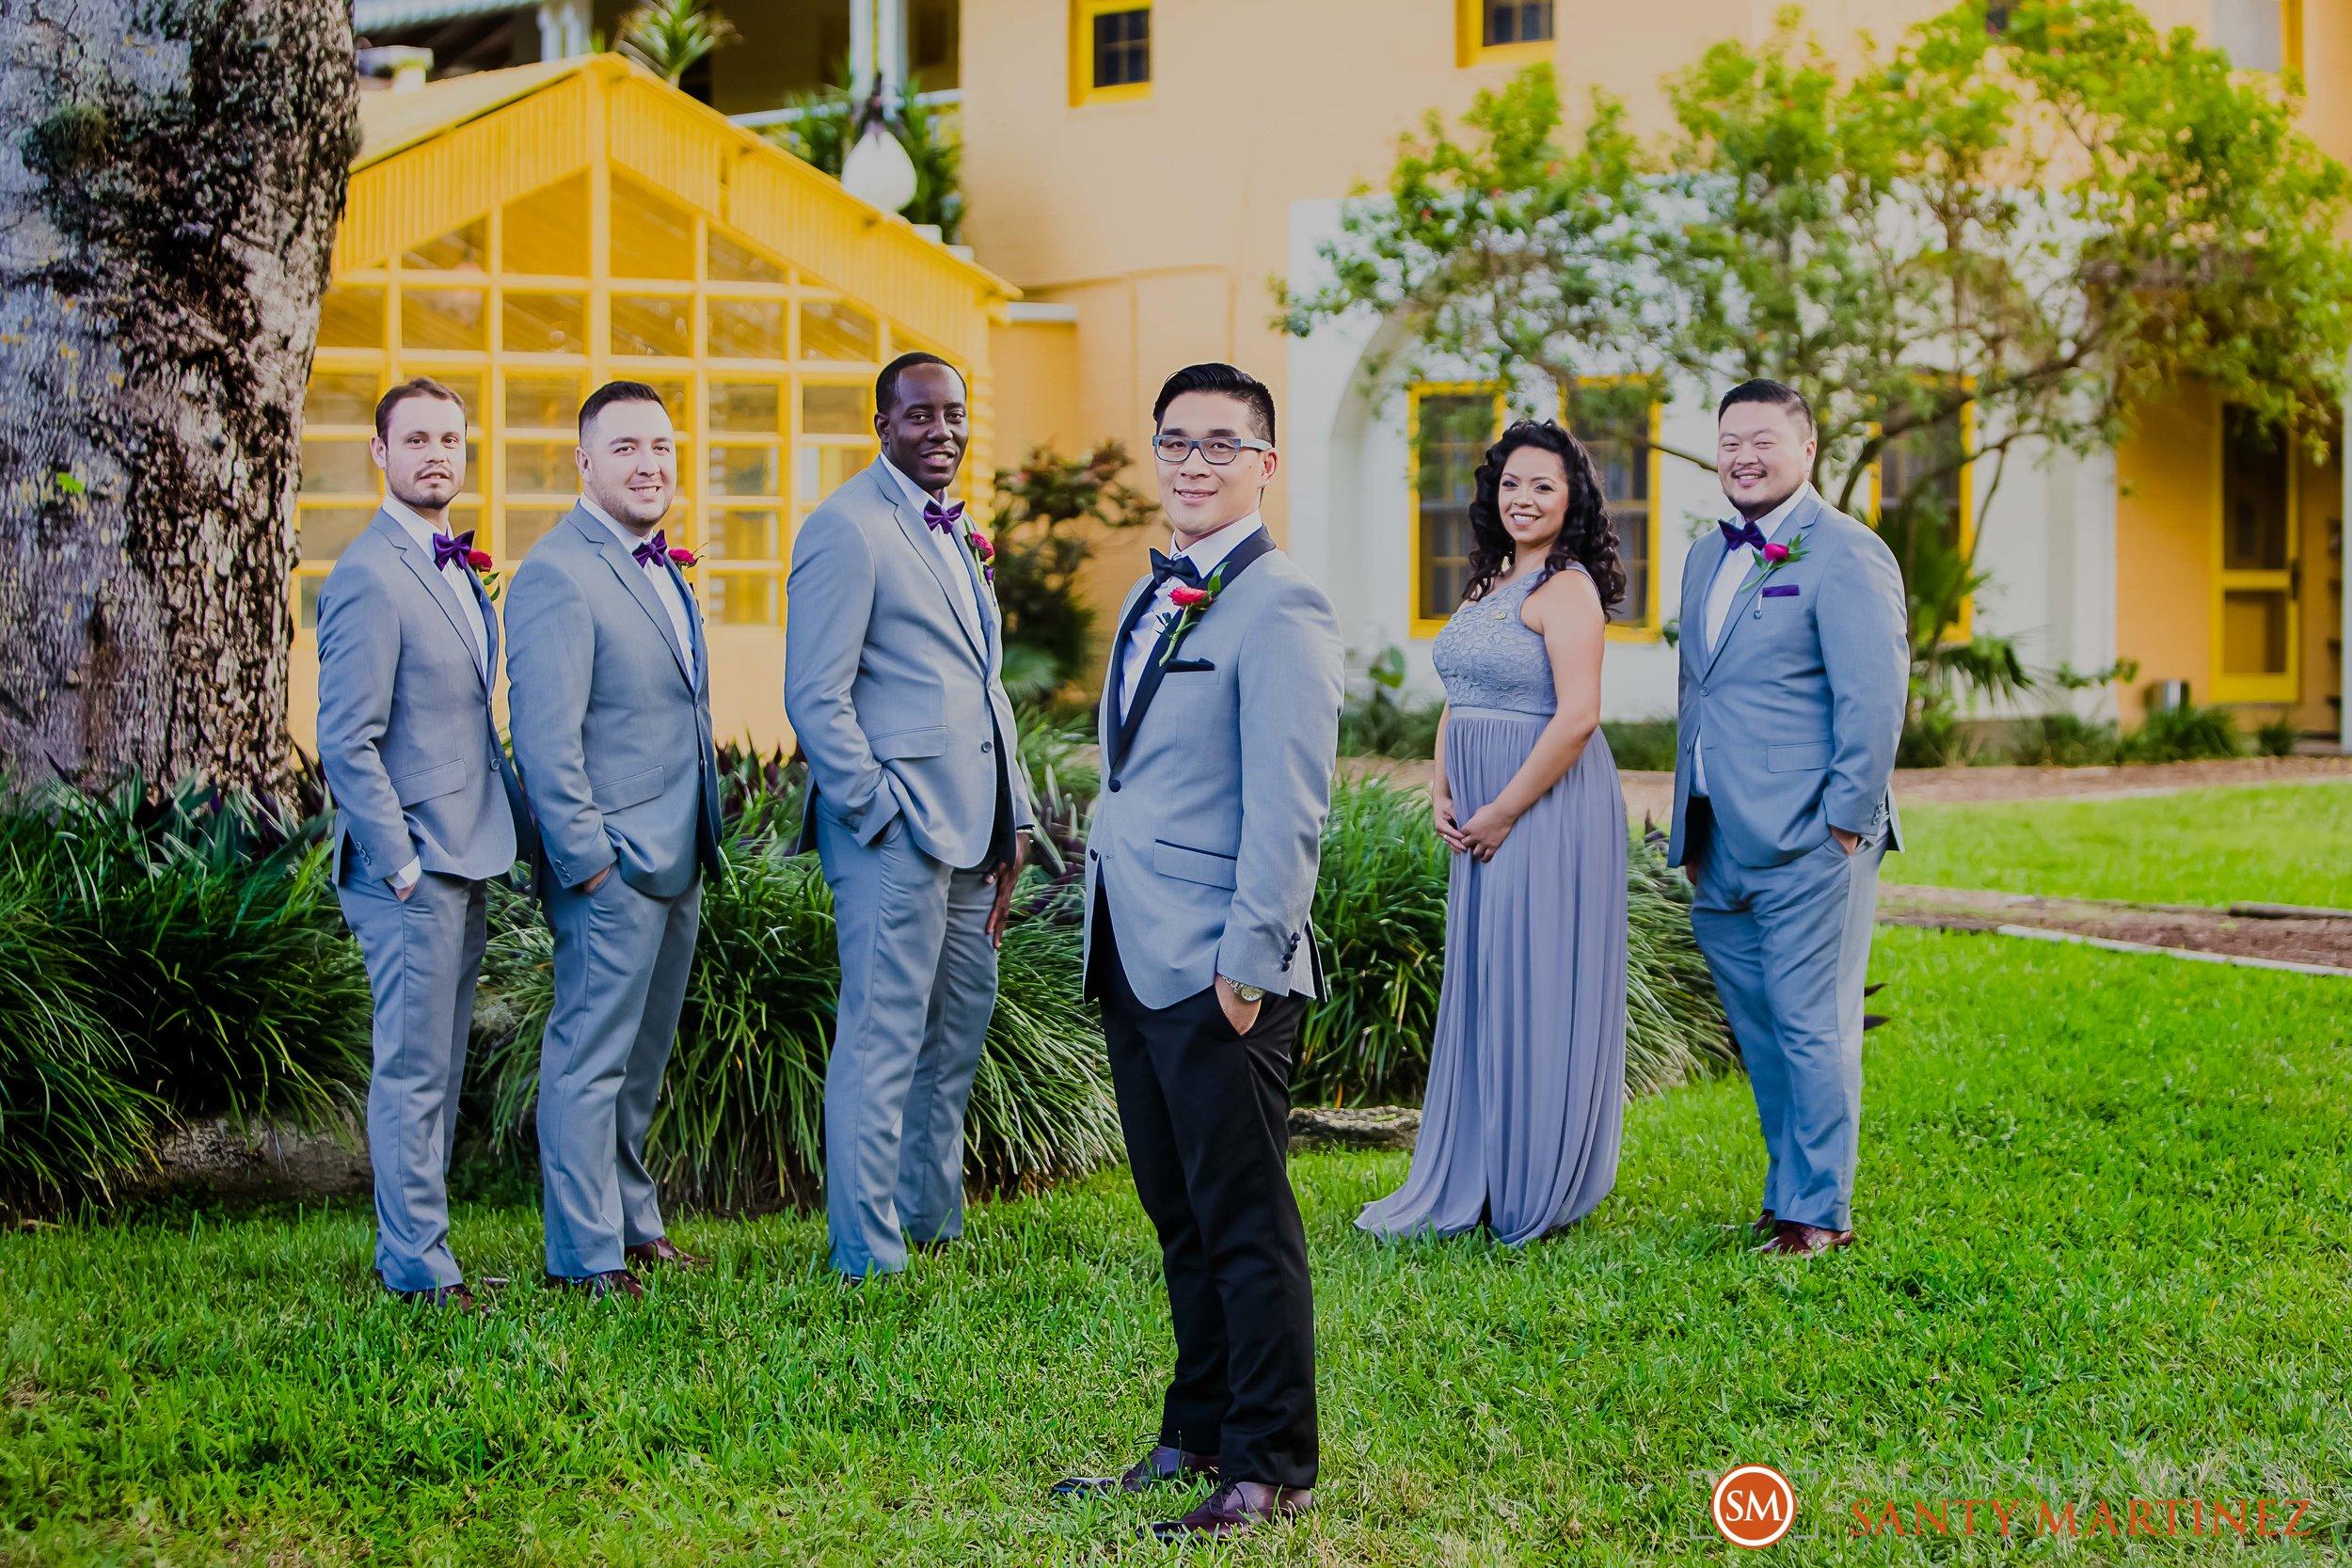 Wedding Bonnet House - Photography by Santy Martinez-8.jpg